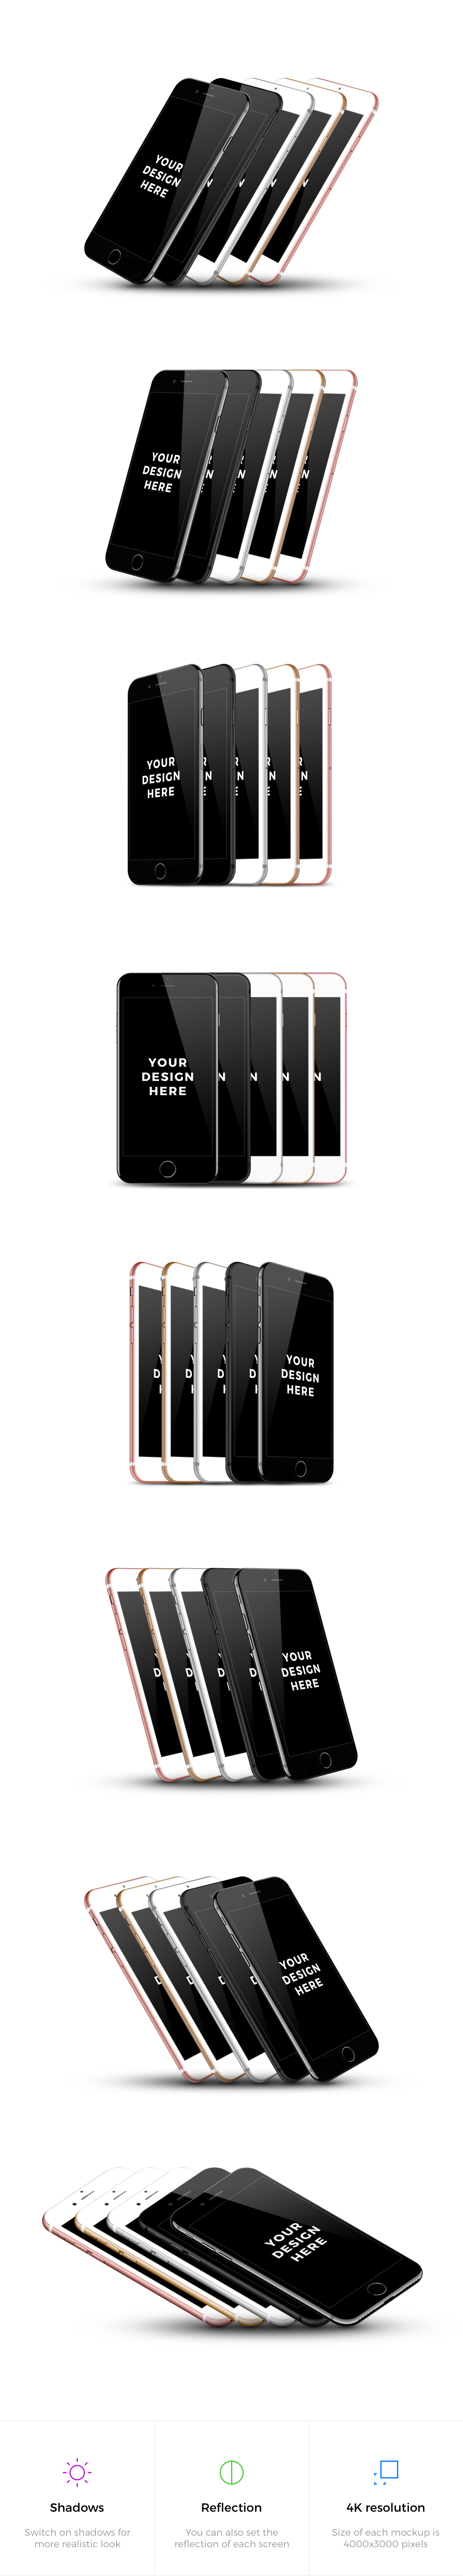 40x iPhone 7 Mockups example image 2